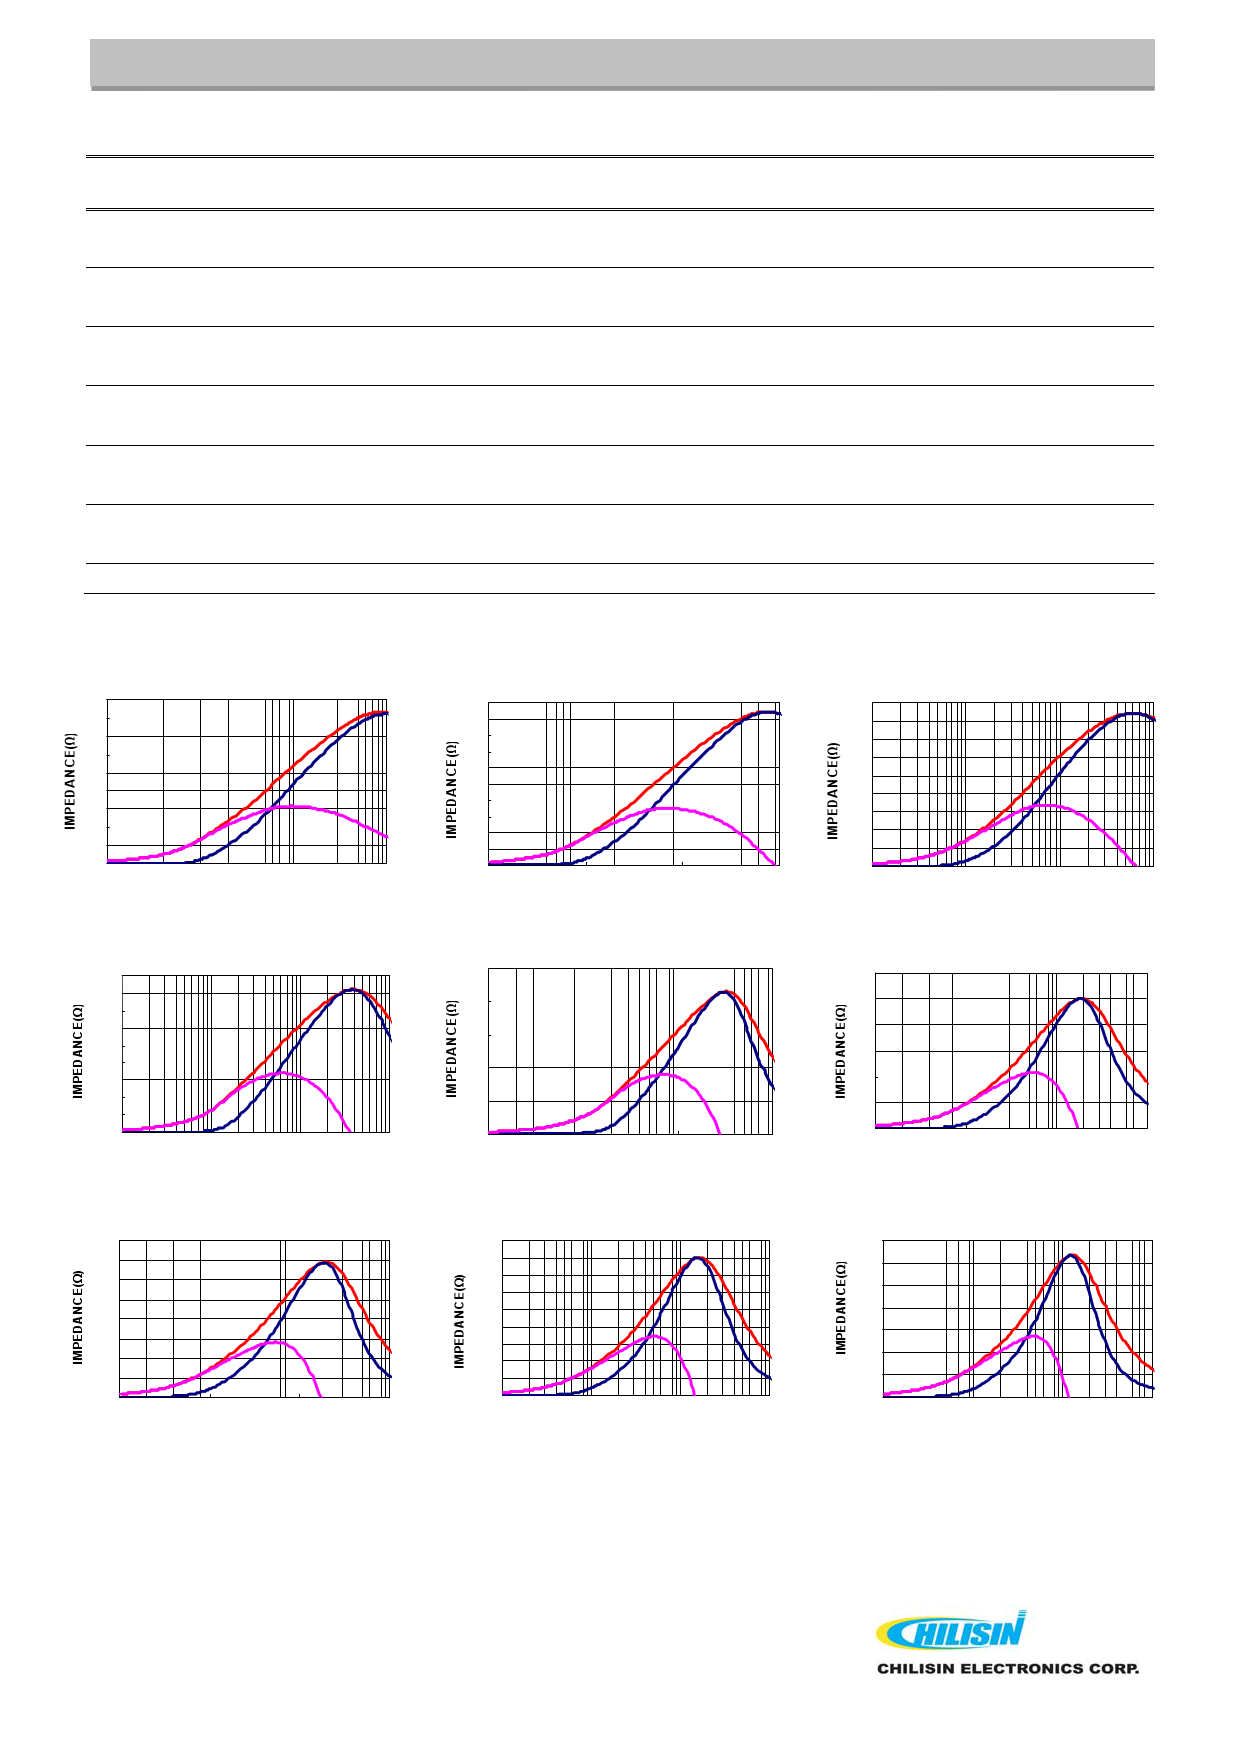 GBK160808T pdf, 반도체, 판매, 대치품